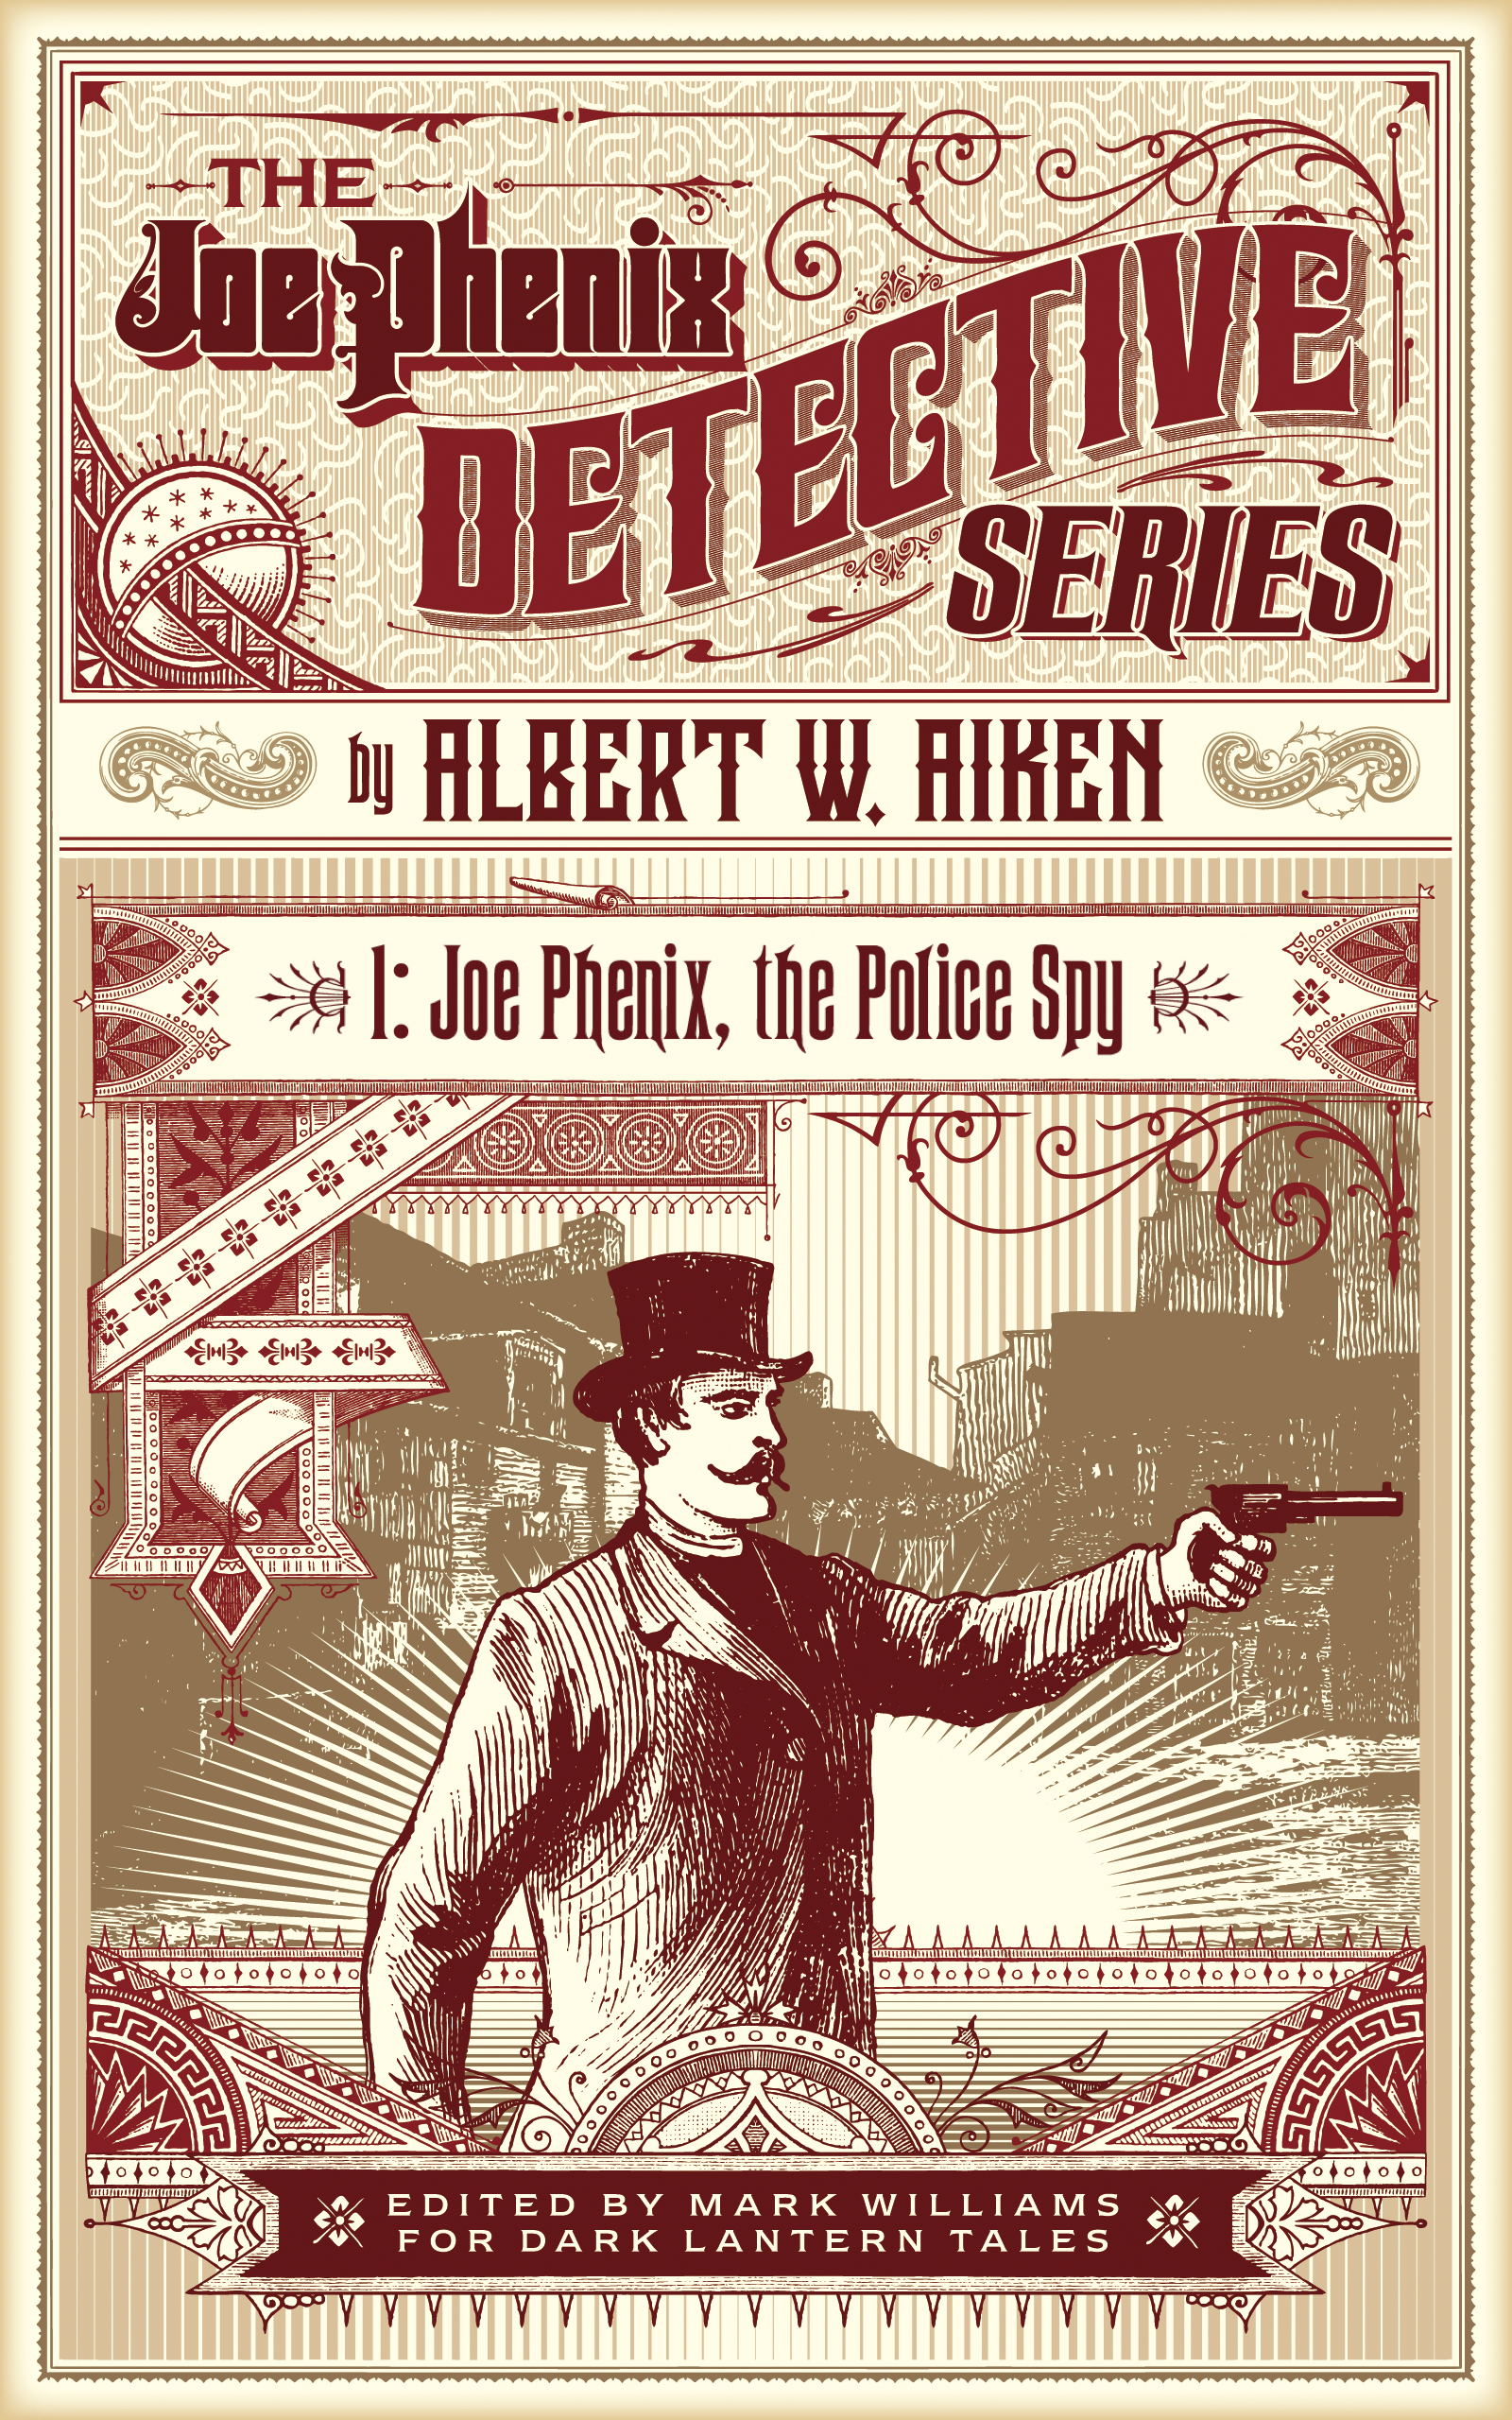 Joe Phenix, the Police Spy